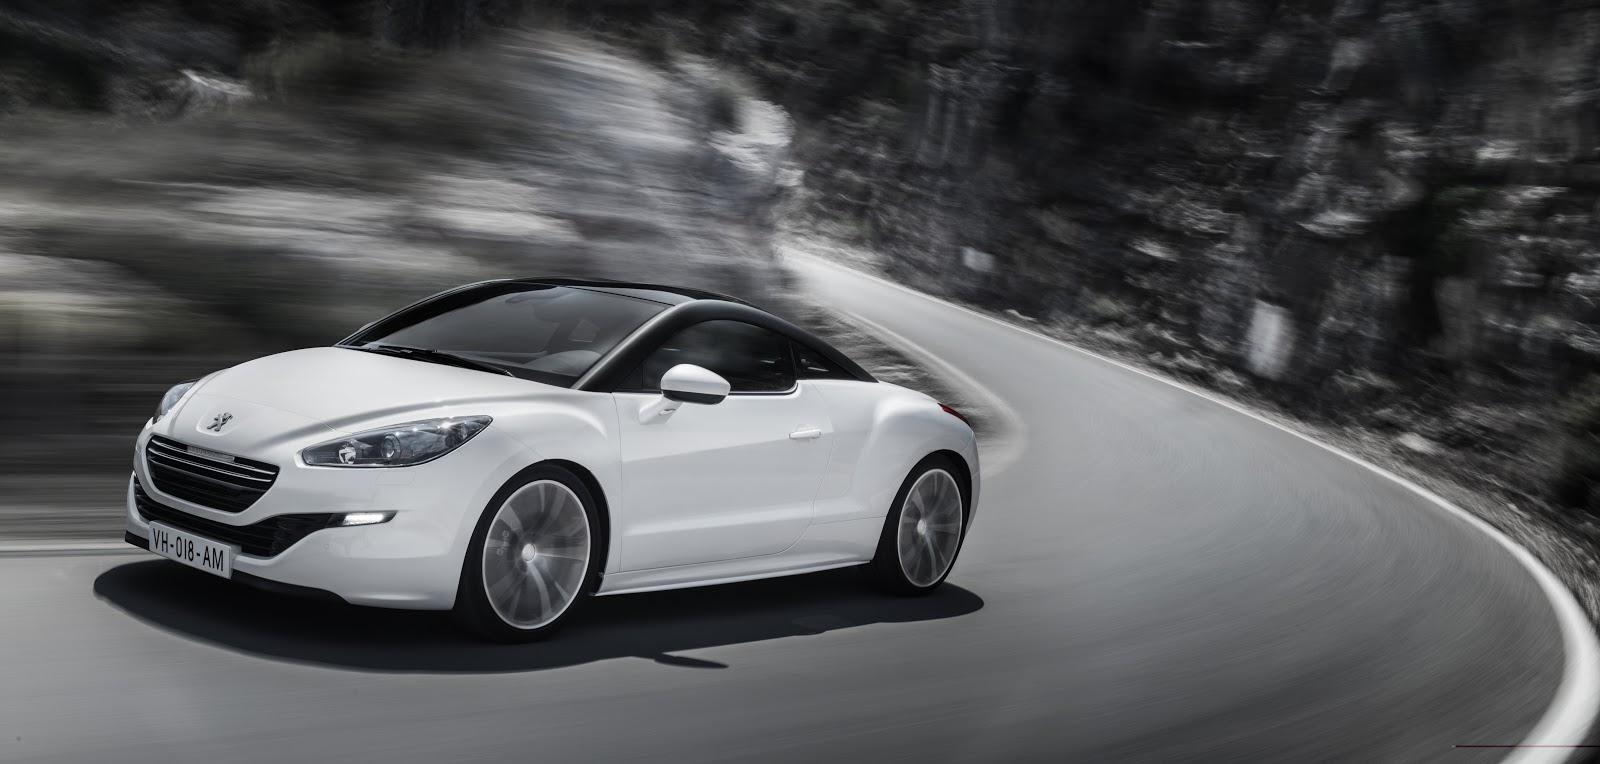 Speedmonkey: Peugeot RCZ Coupé - pricing and specs